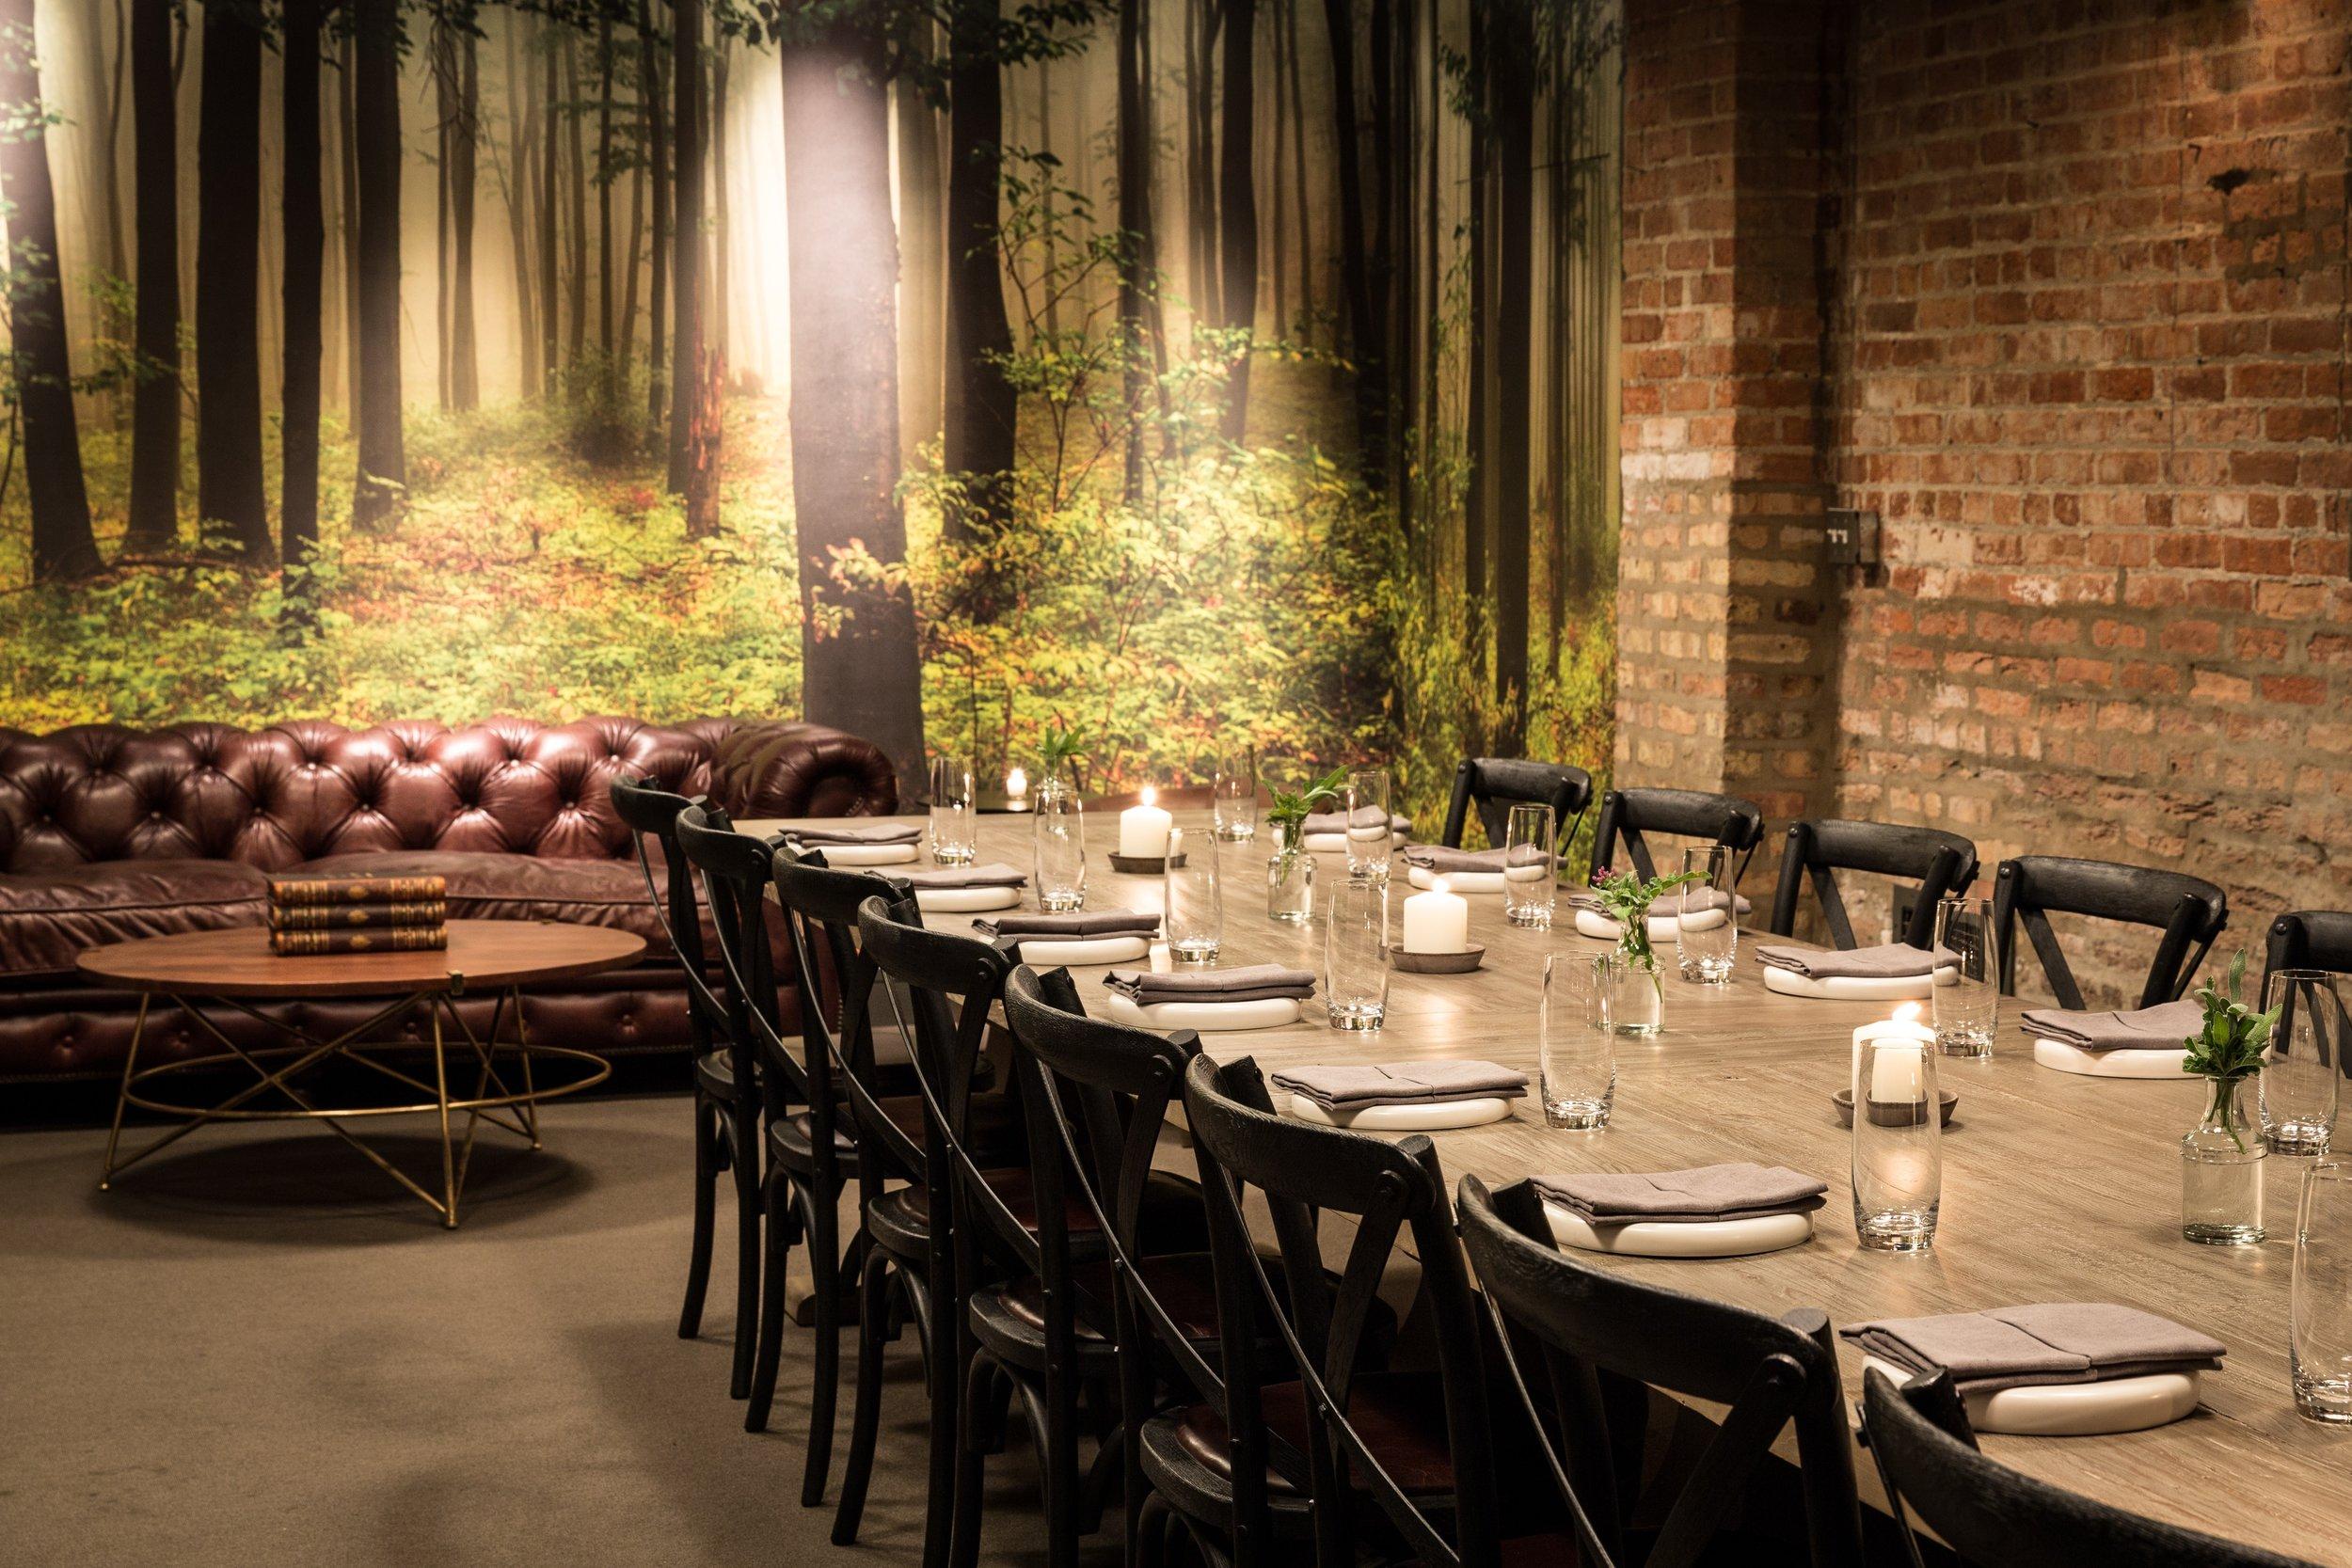 studio-saint-bars-and-restaurants-smyth-and-the-loyalist-washington-dc-22